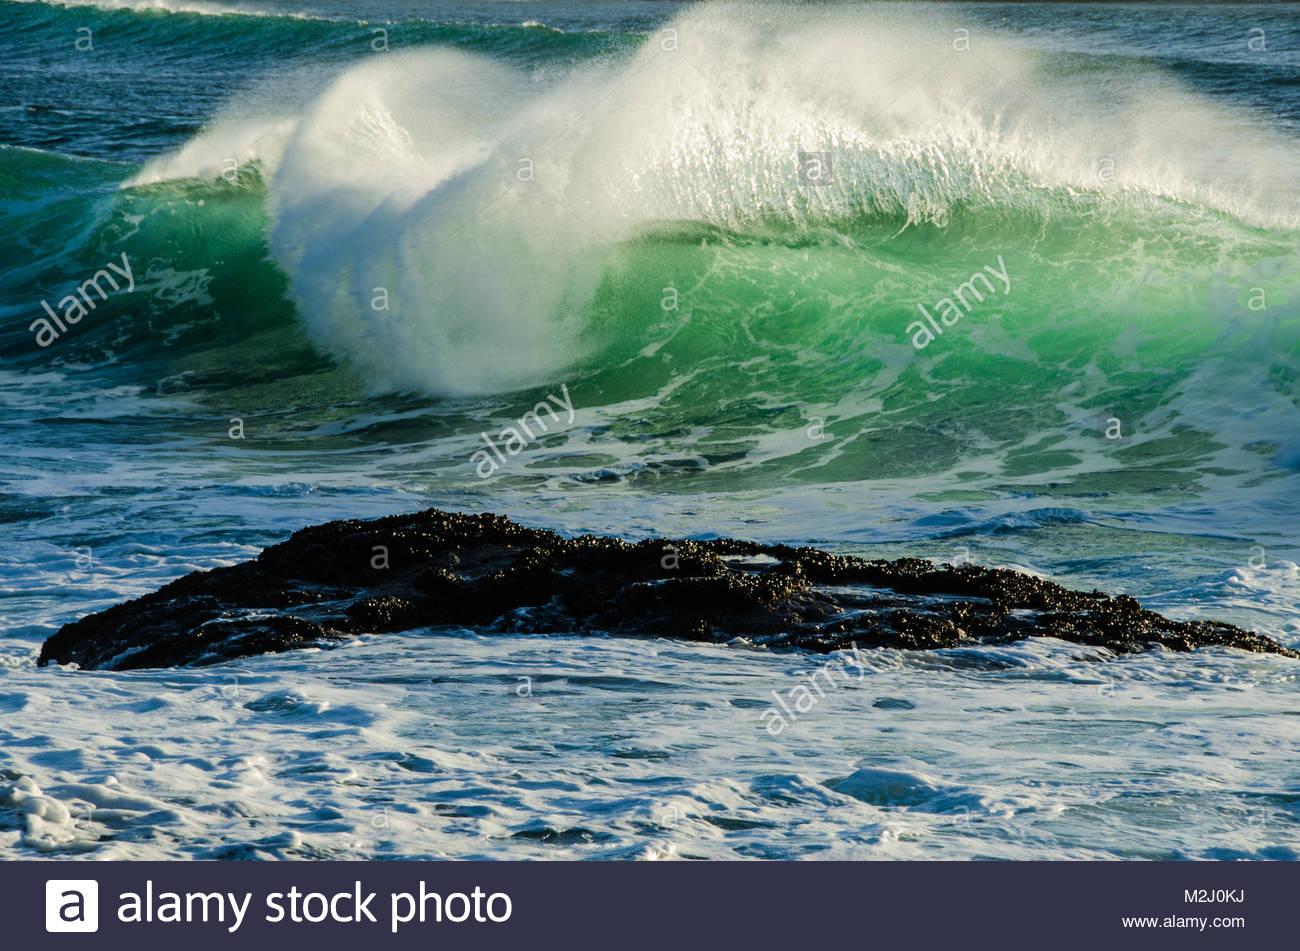 Cox bay near tofino stock photos cox bay near tofino stock a back lit emerald wave crashes in cox bay near tofino on vancouver islands nvjuhfo Image collections